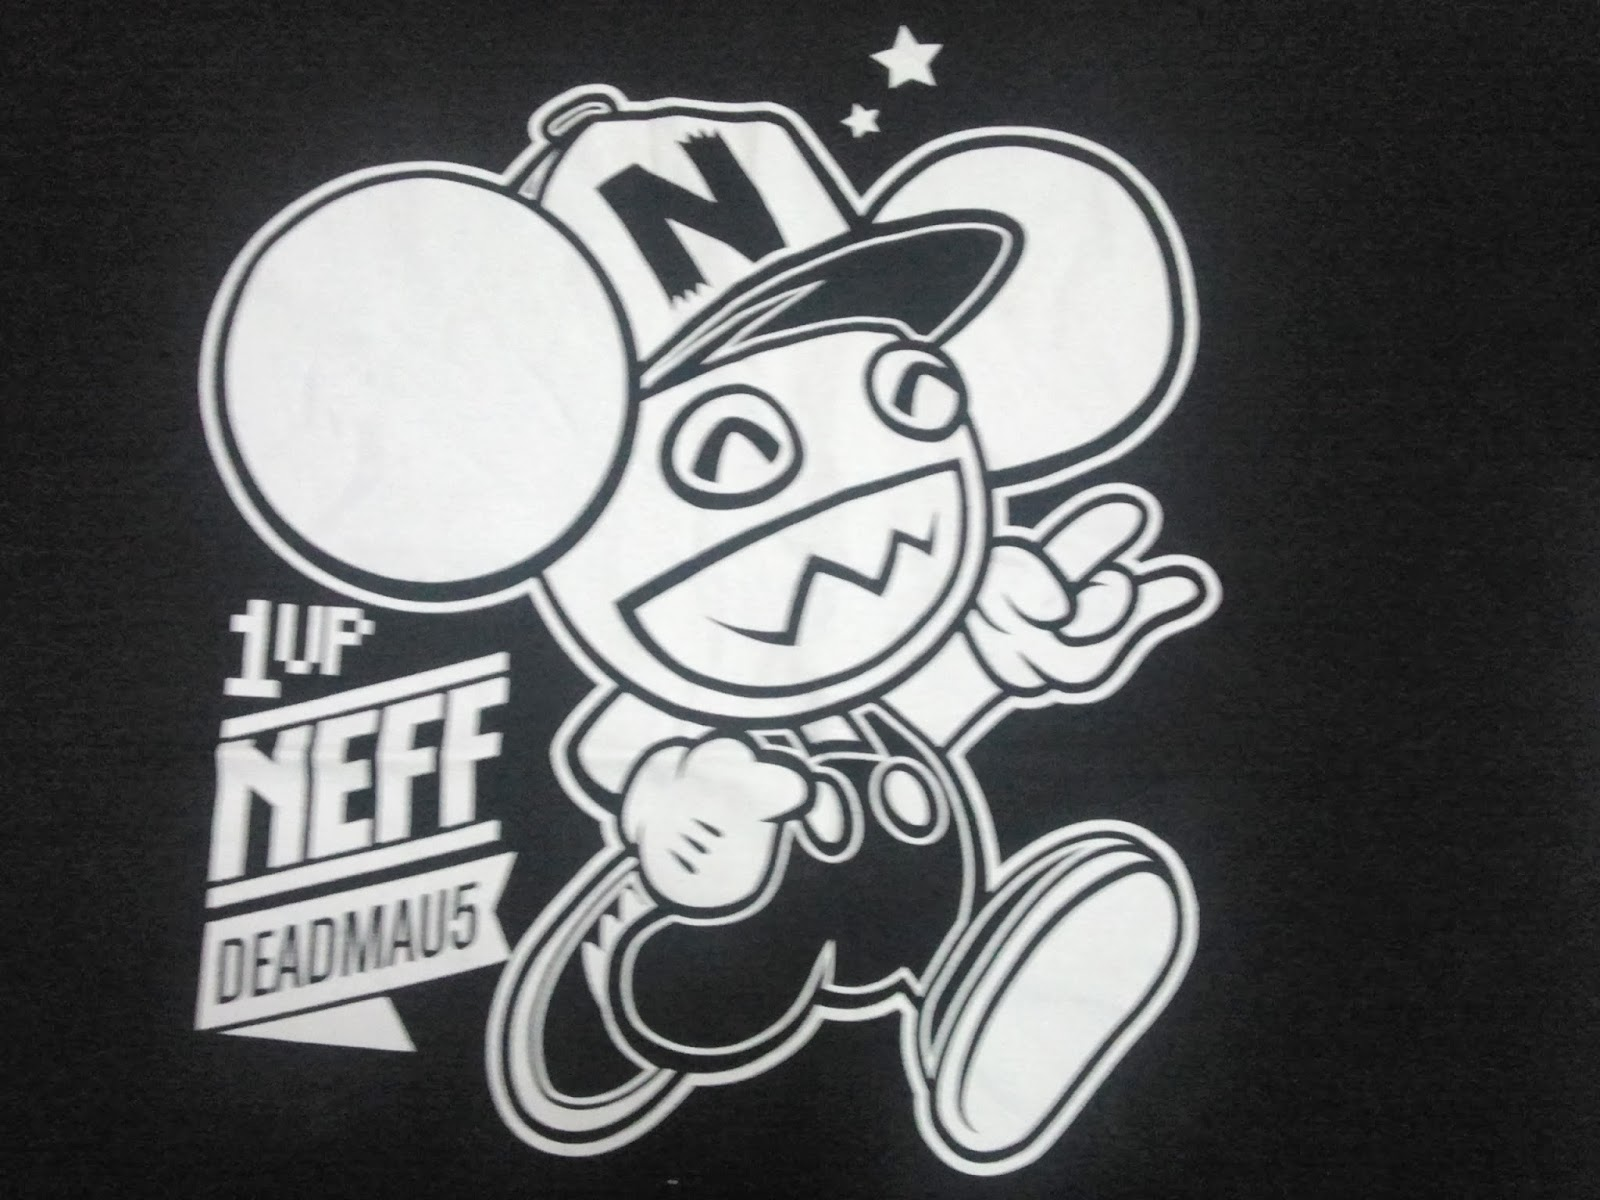 Deadmau5   Neff